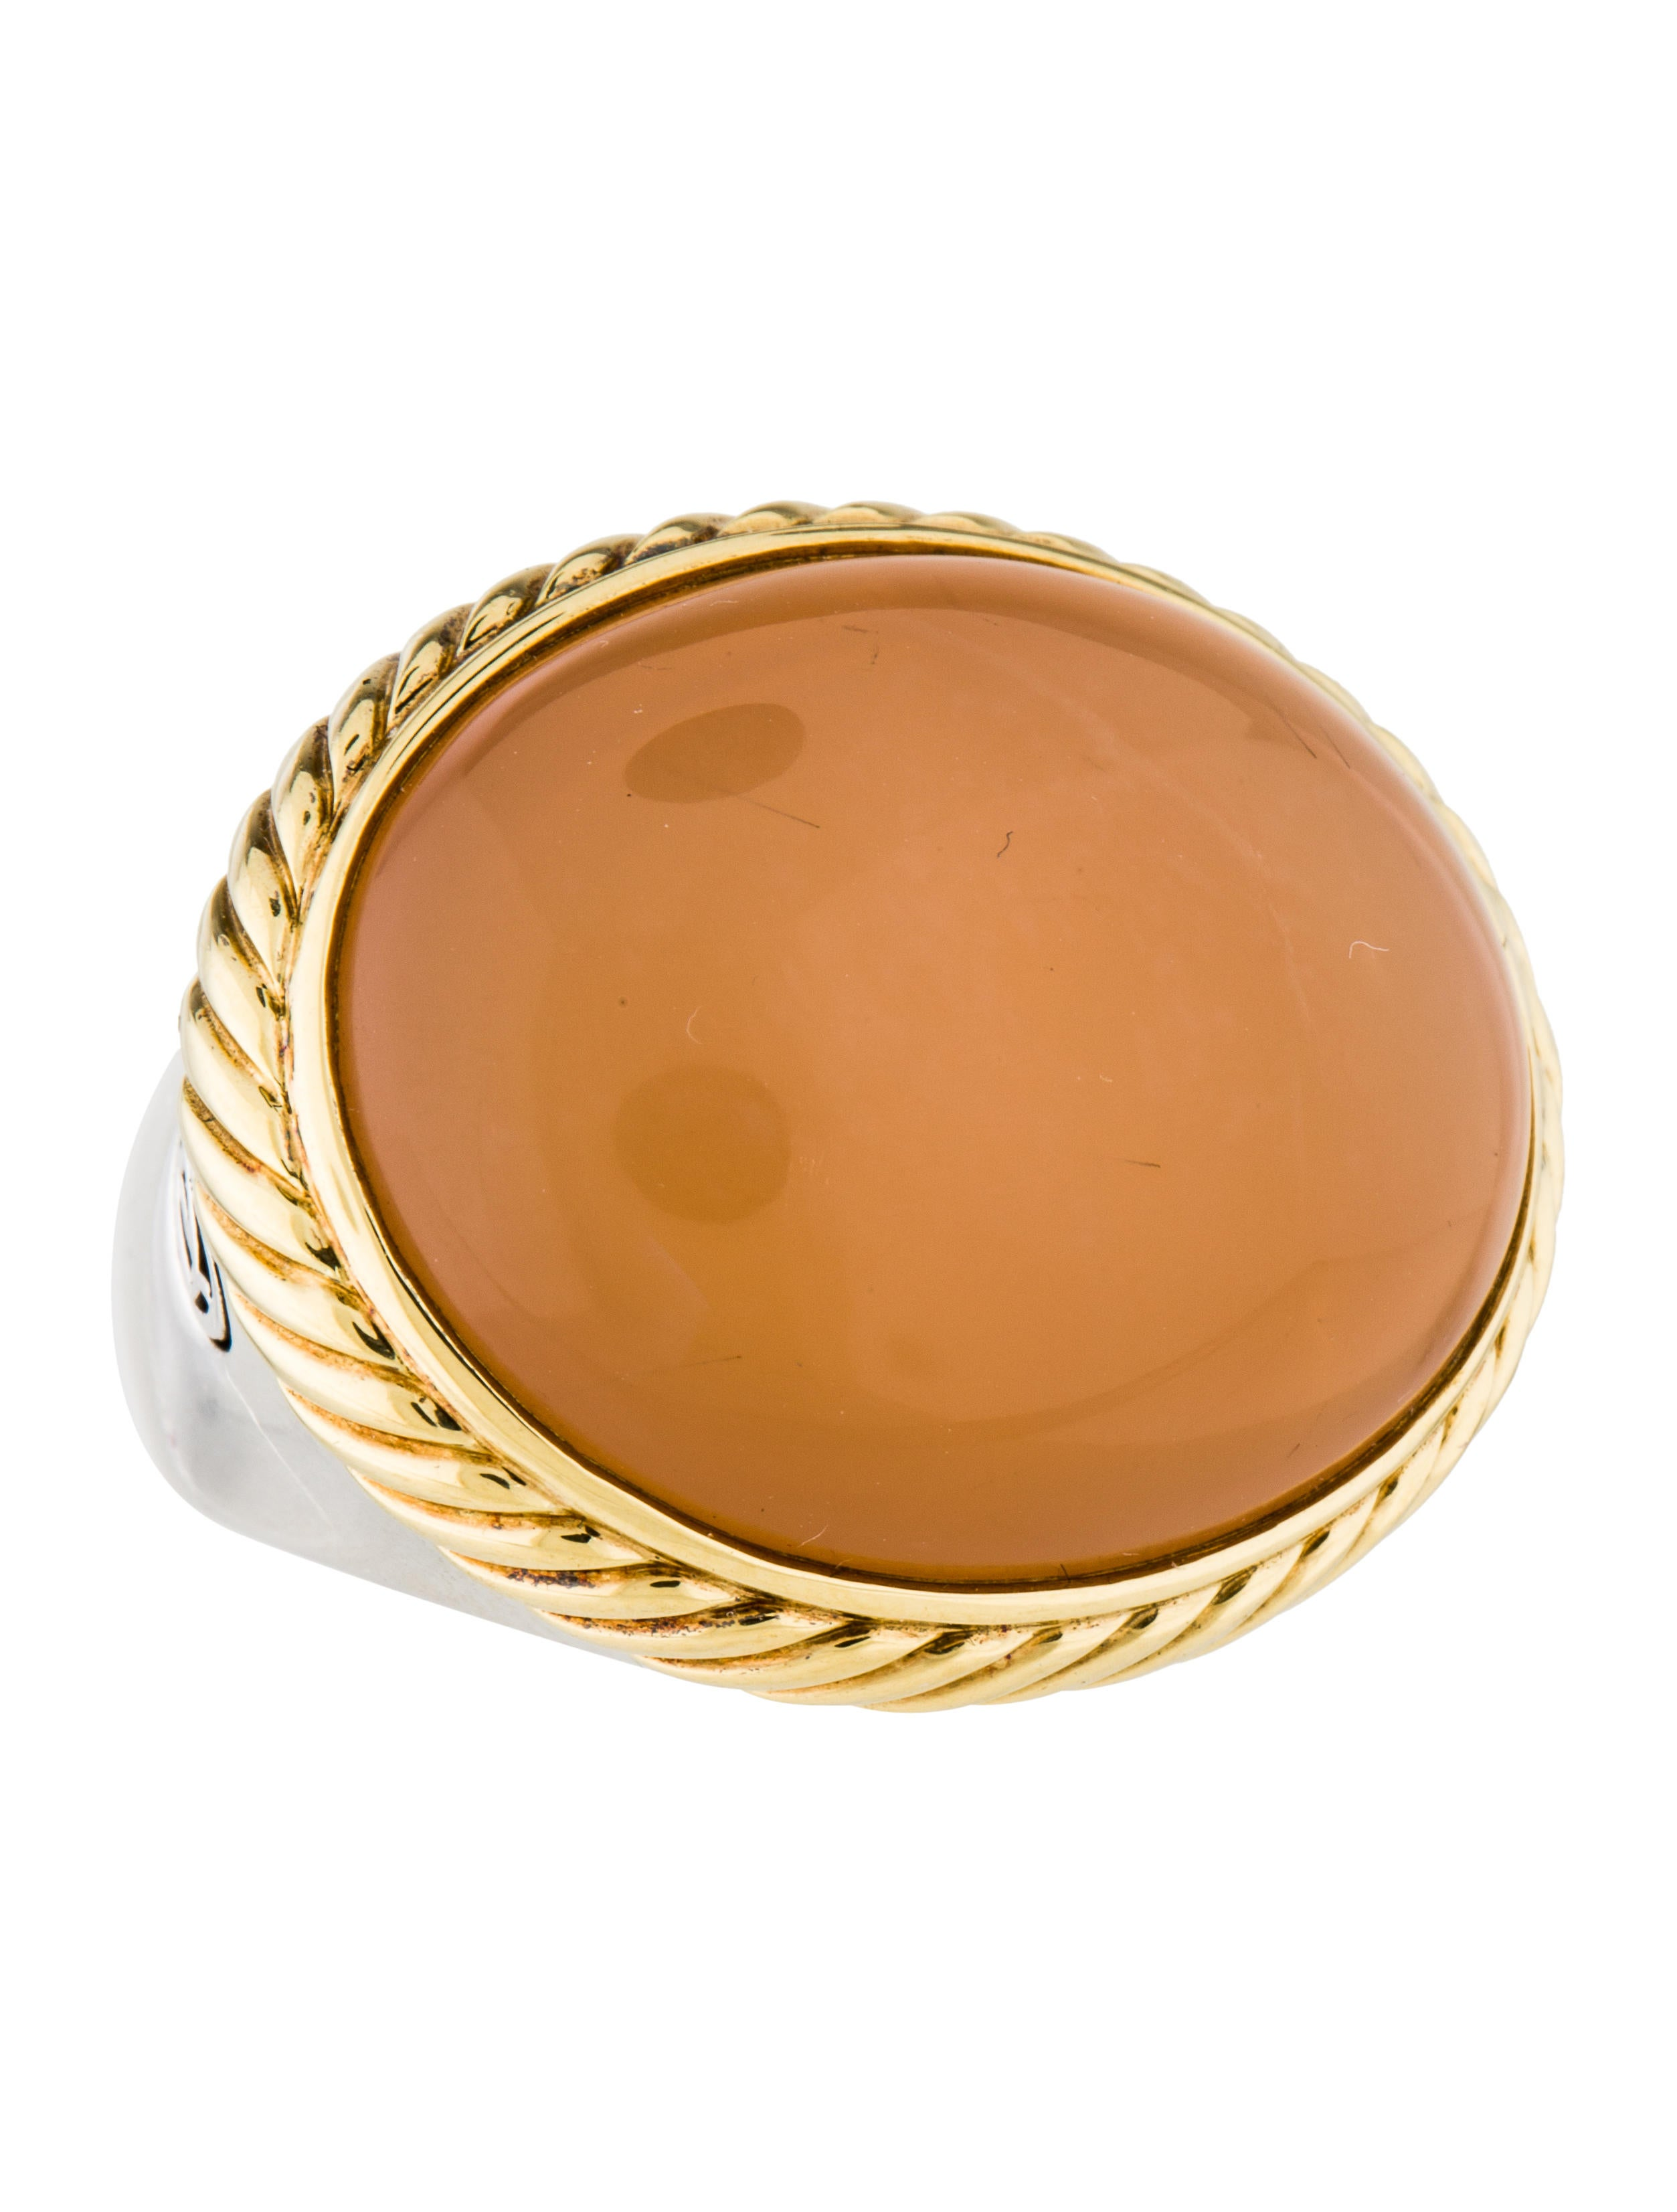 David yurman moonstone cocktail ring rings dvy40842 for David yurman inspired jewelry rings